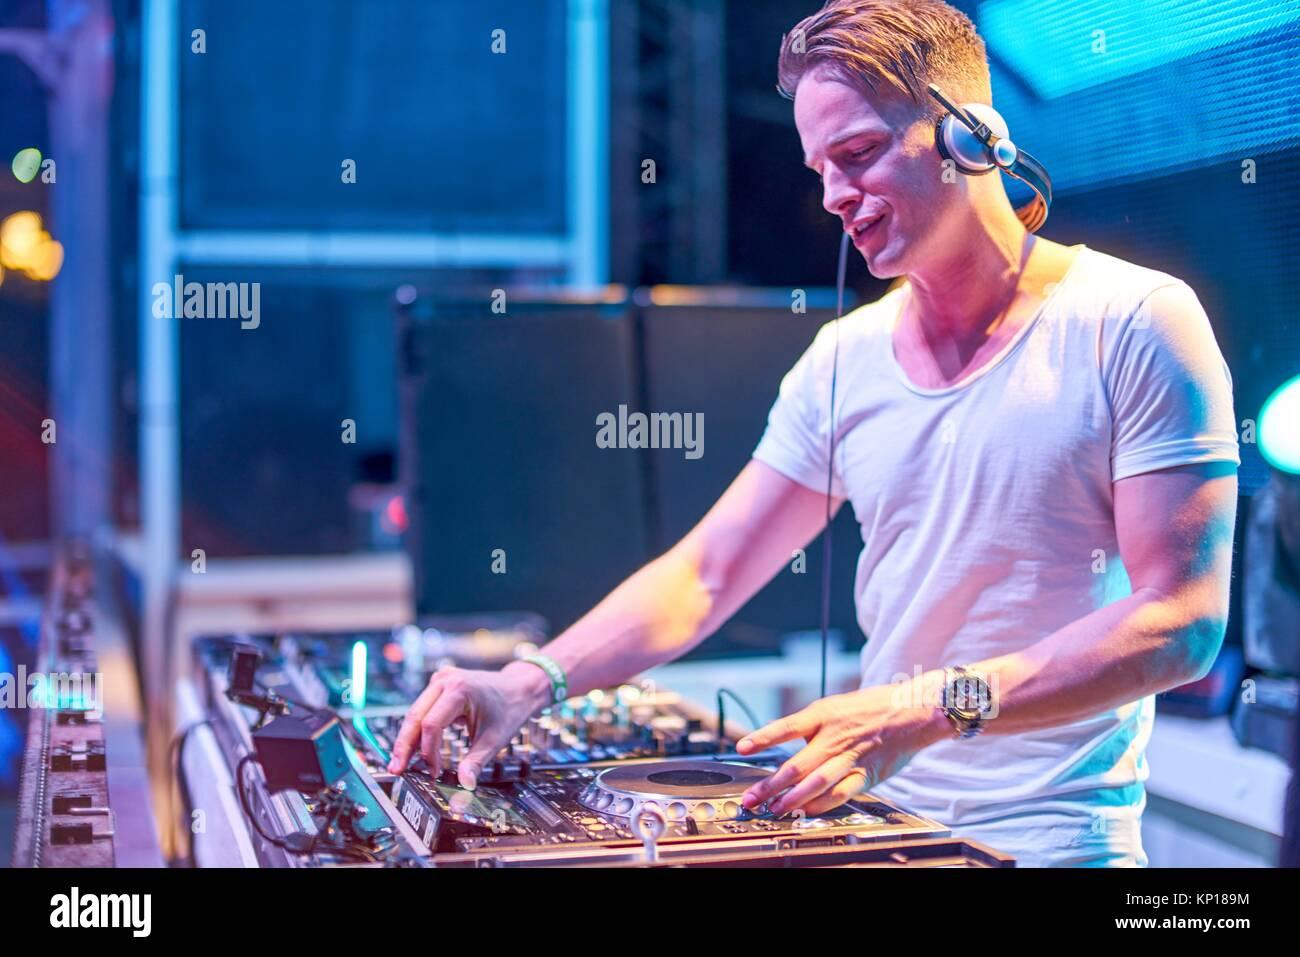 DJ Dannic at music festival Starbeach in Hersonissos, Crete, Greece, on 24. July 2017 - Stock Image